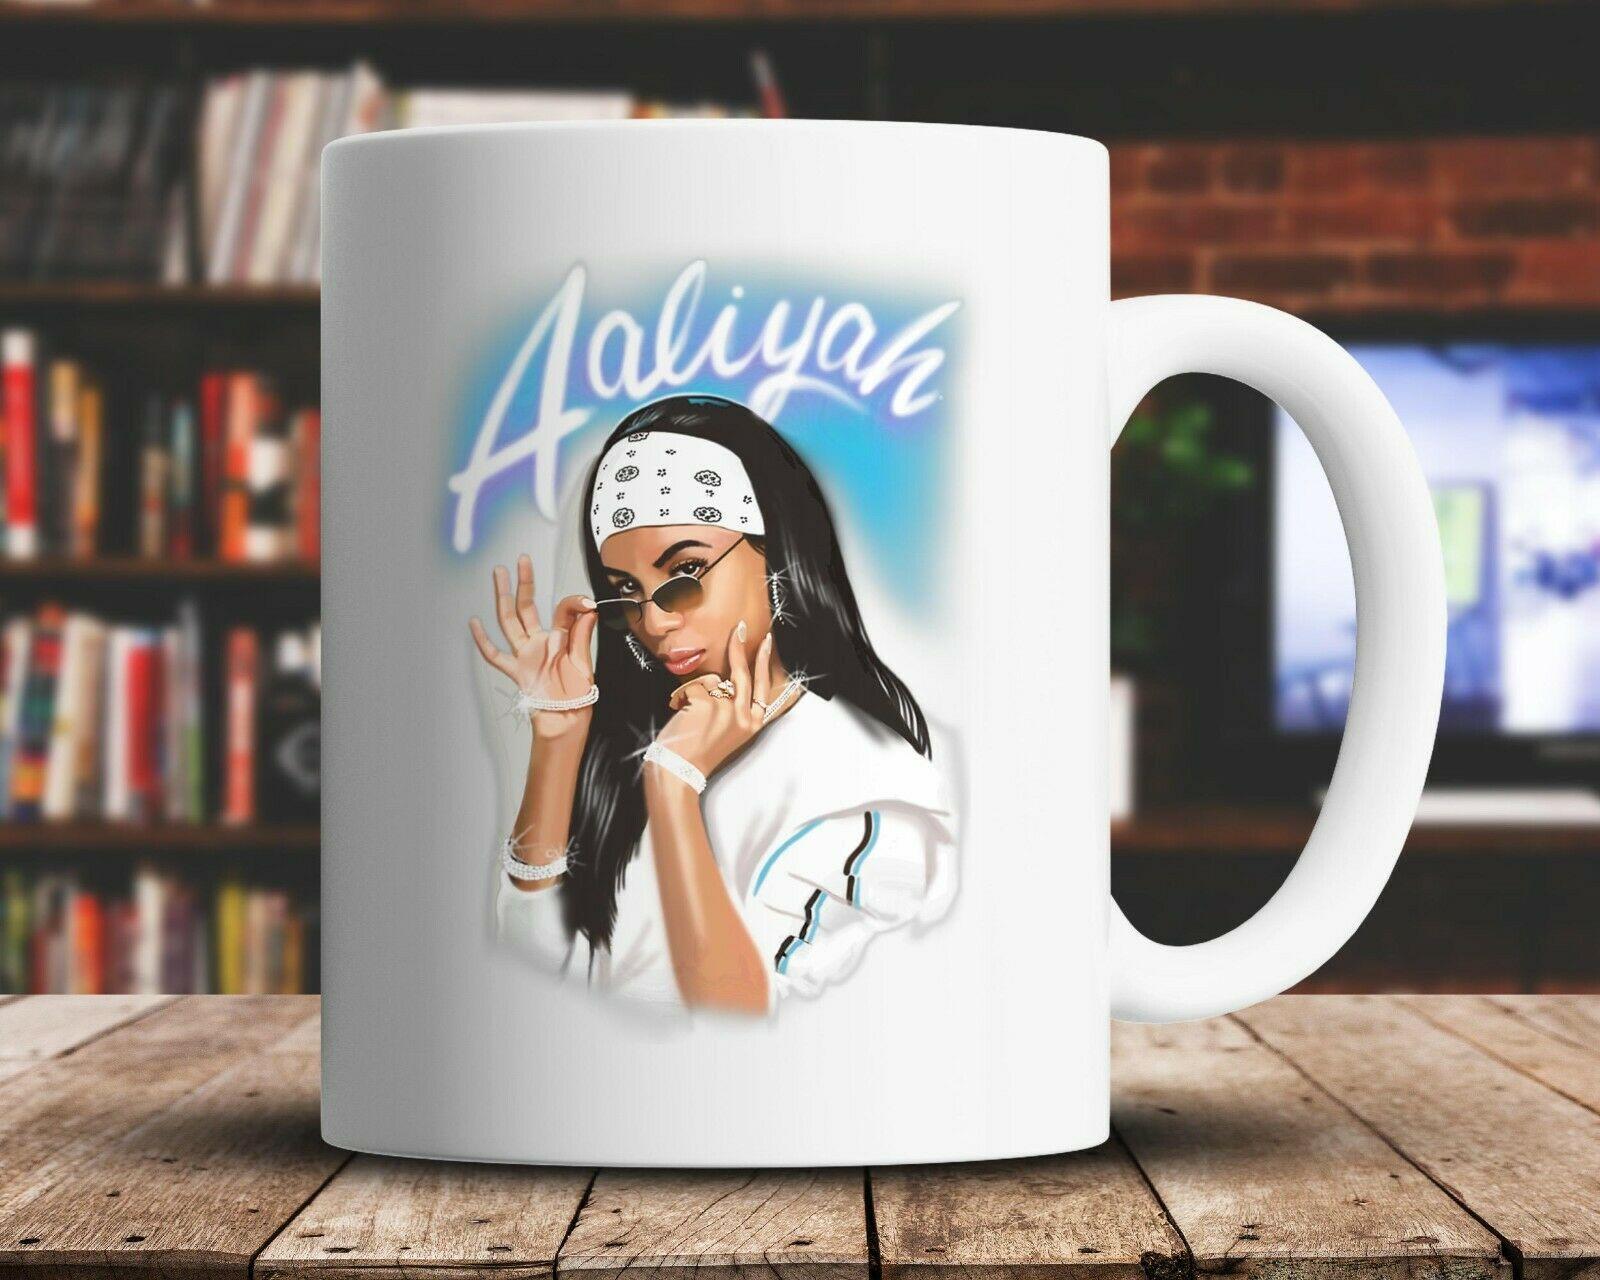 Aaliyah مغني الموسيقى عاشق مضحك السيراميك القدح الشوكولاته الشاي فنجان القهوة